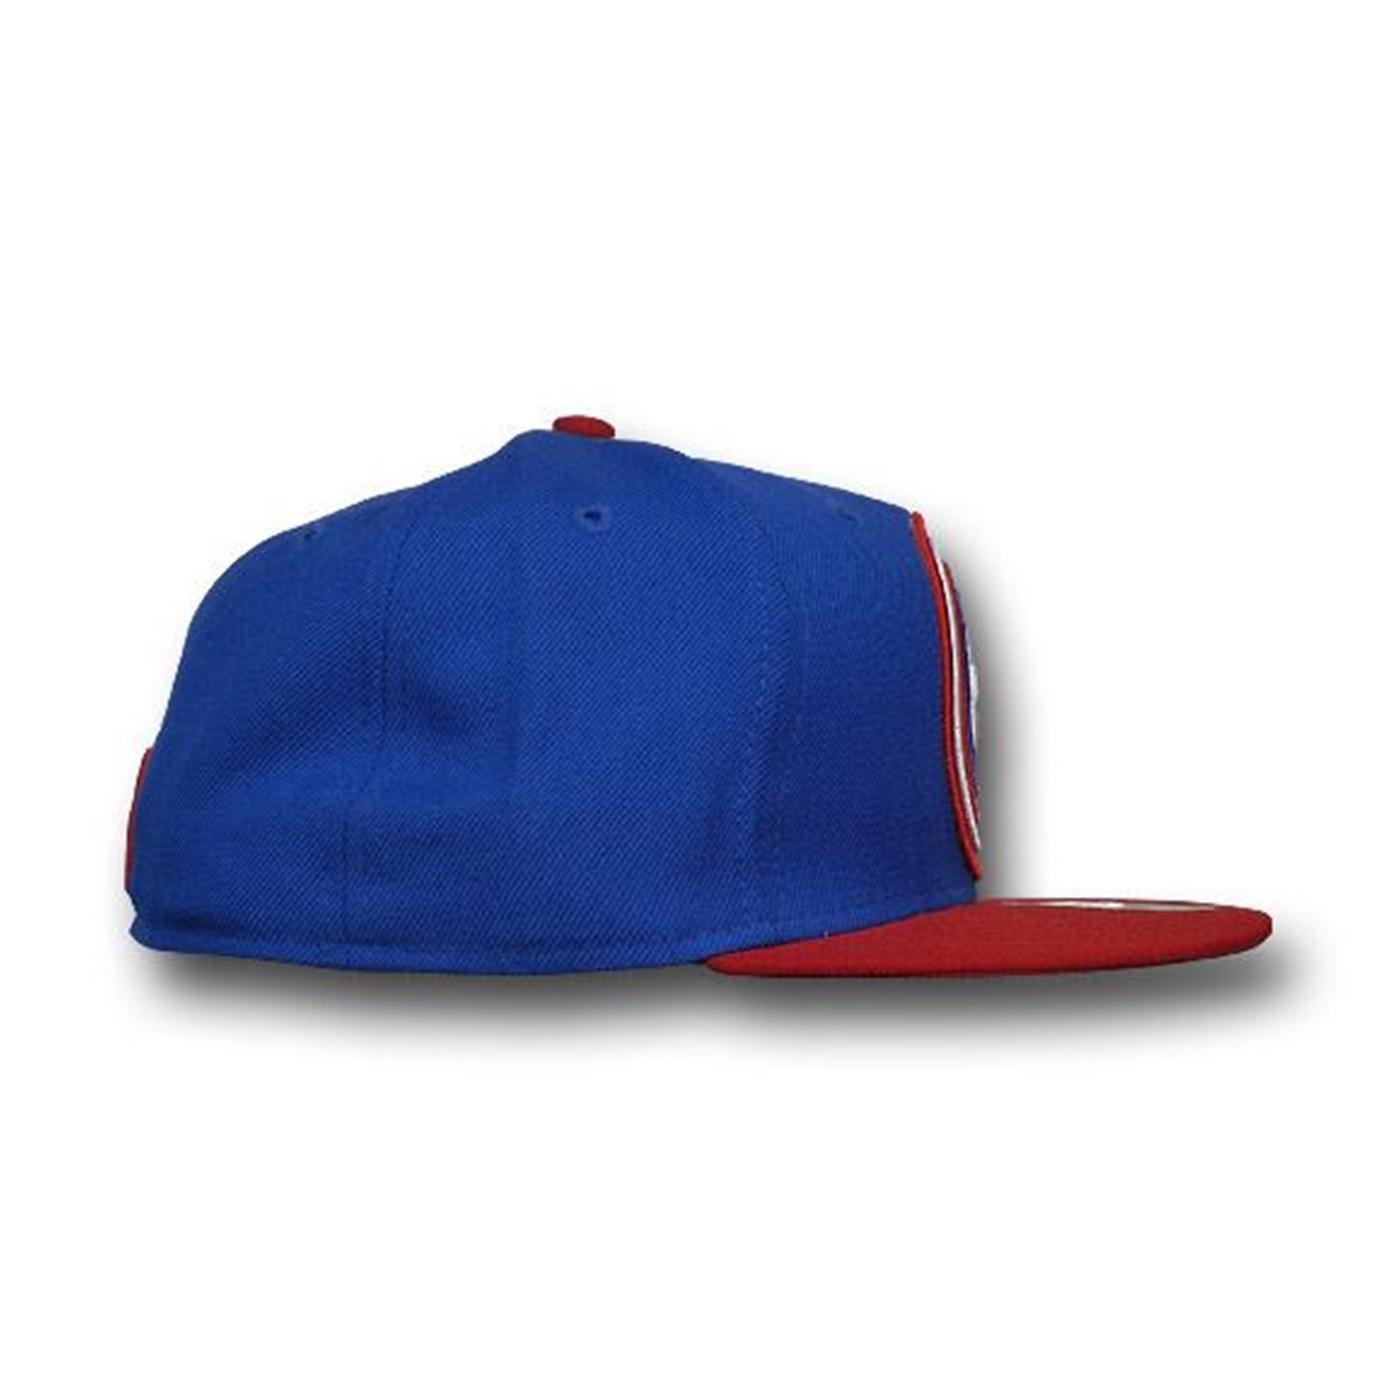 Captain America Target Shield Flat Bill 59Fifty Cap